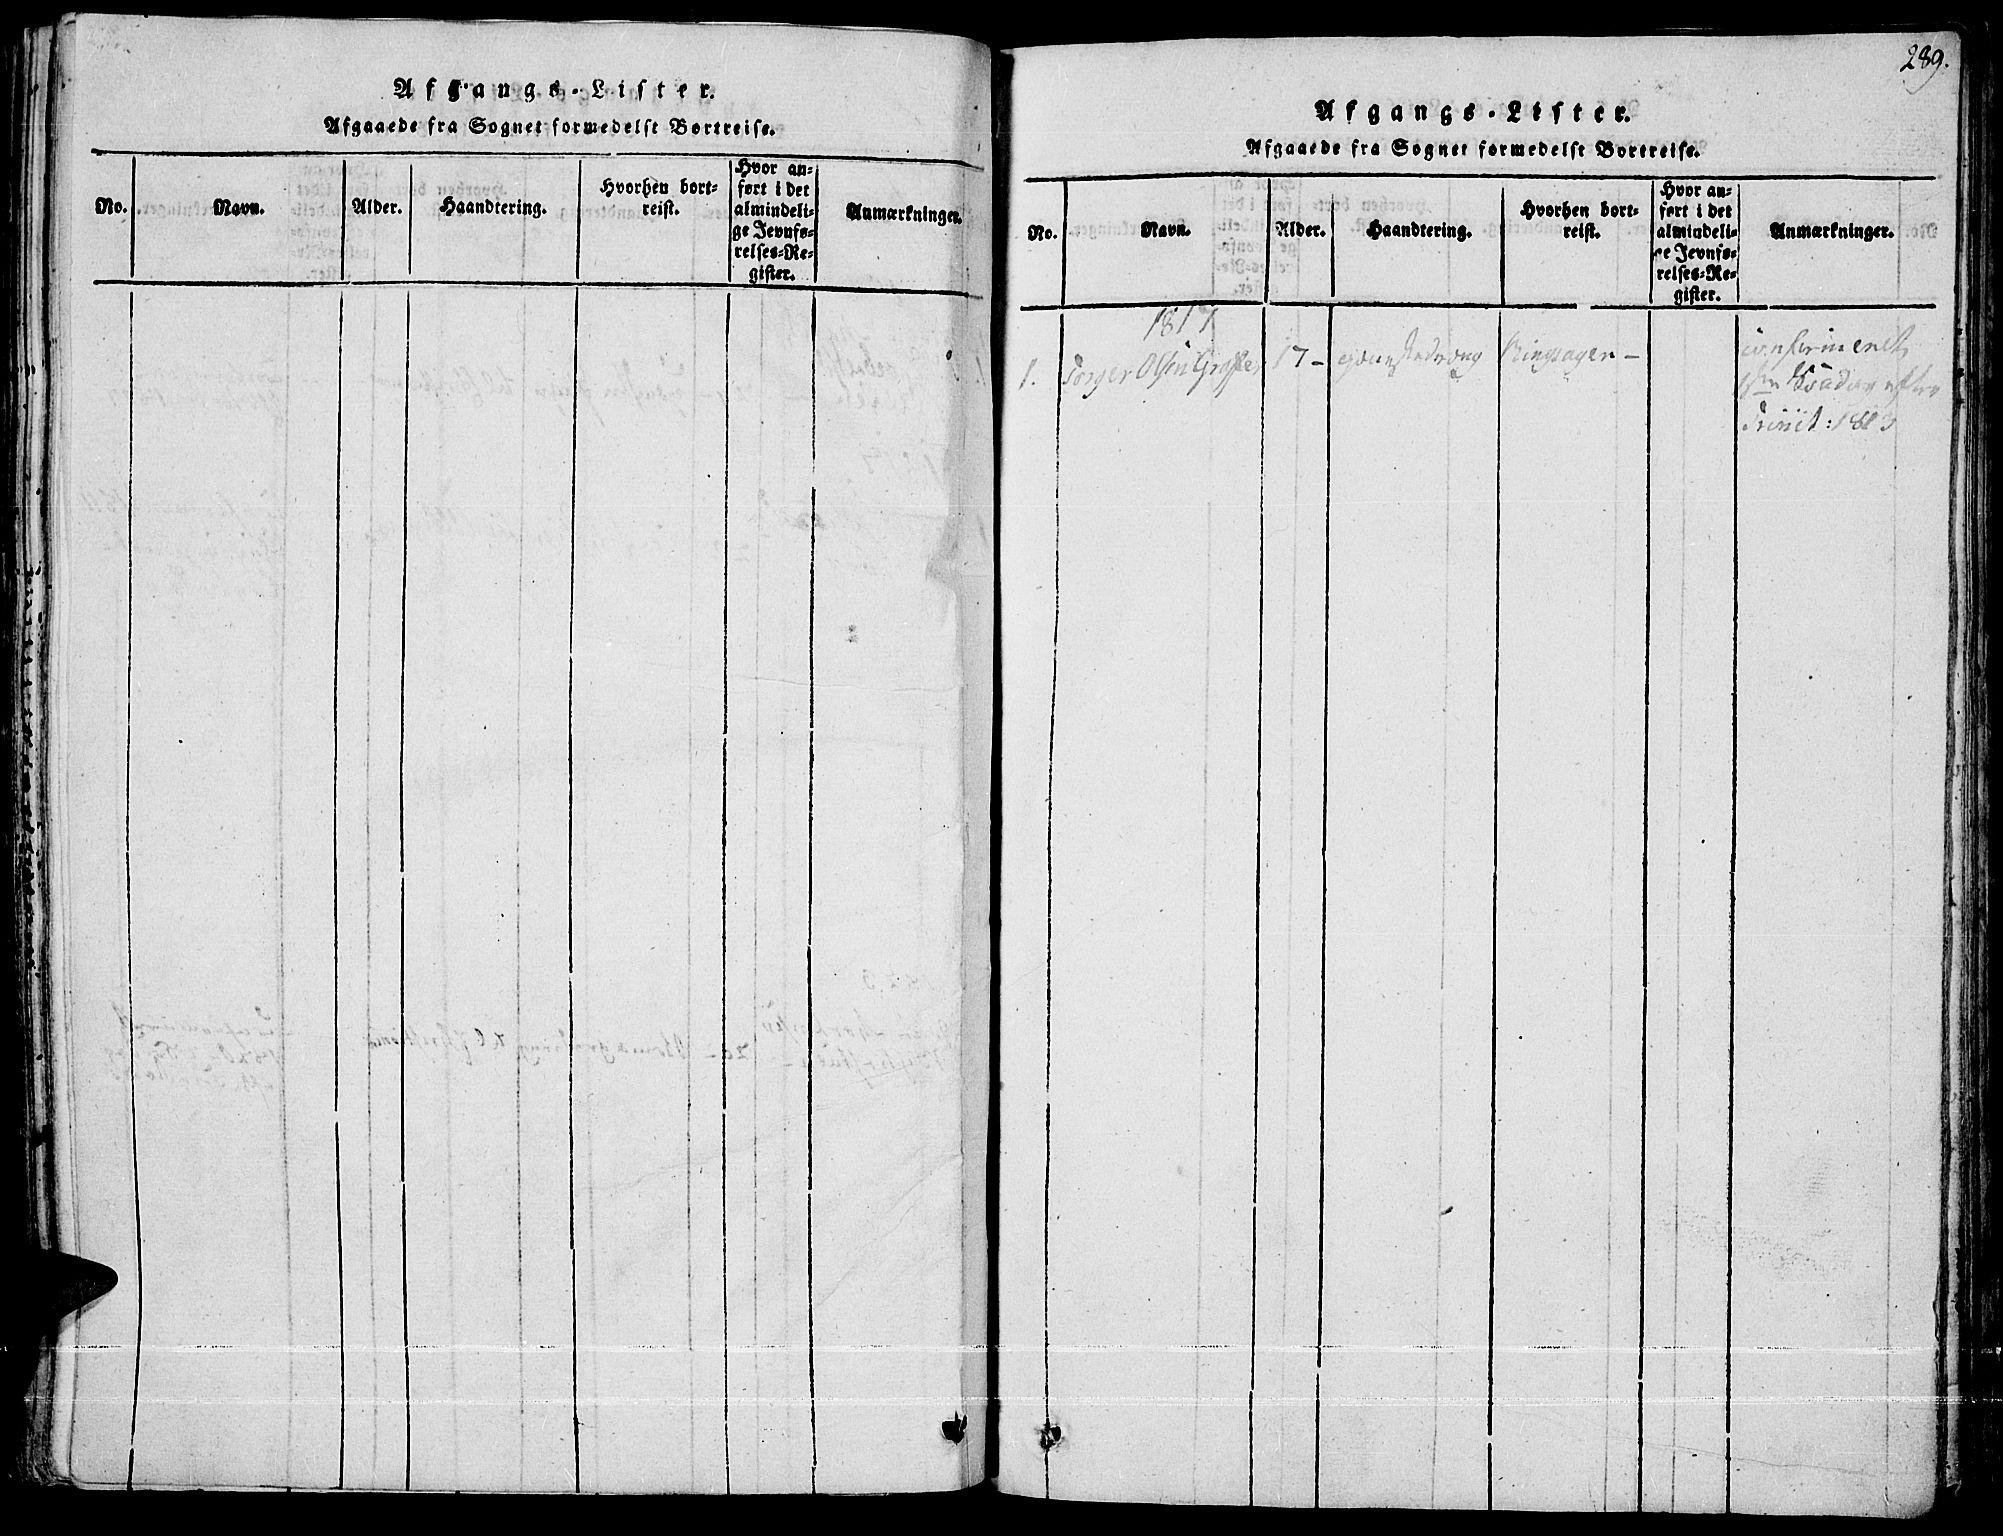 SAH, Fron prestekontor, H/Ha/Haa/L0002: Ministerialbok nr. 2, 1816-1827, s. 289